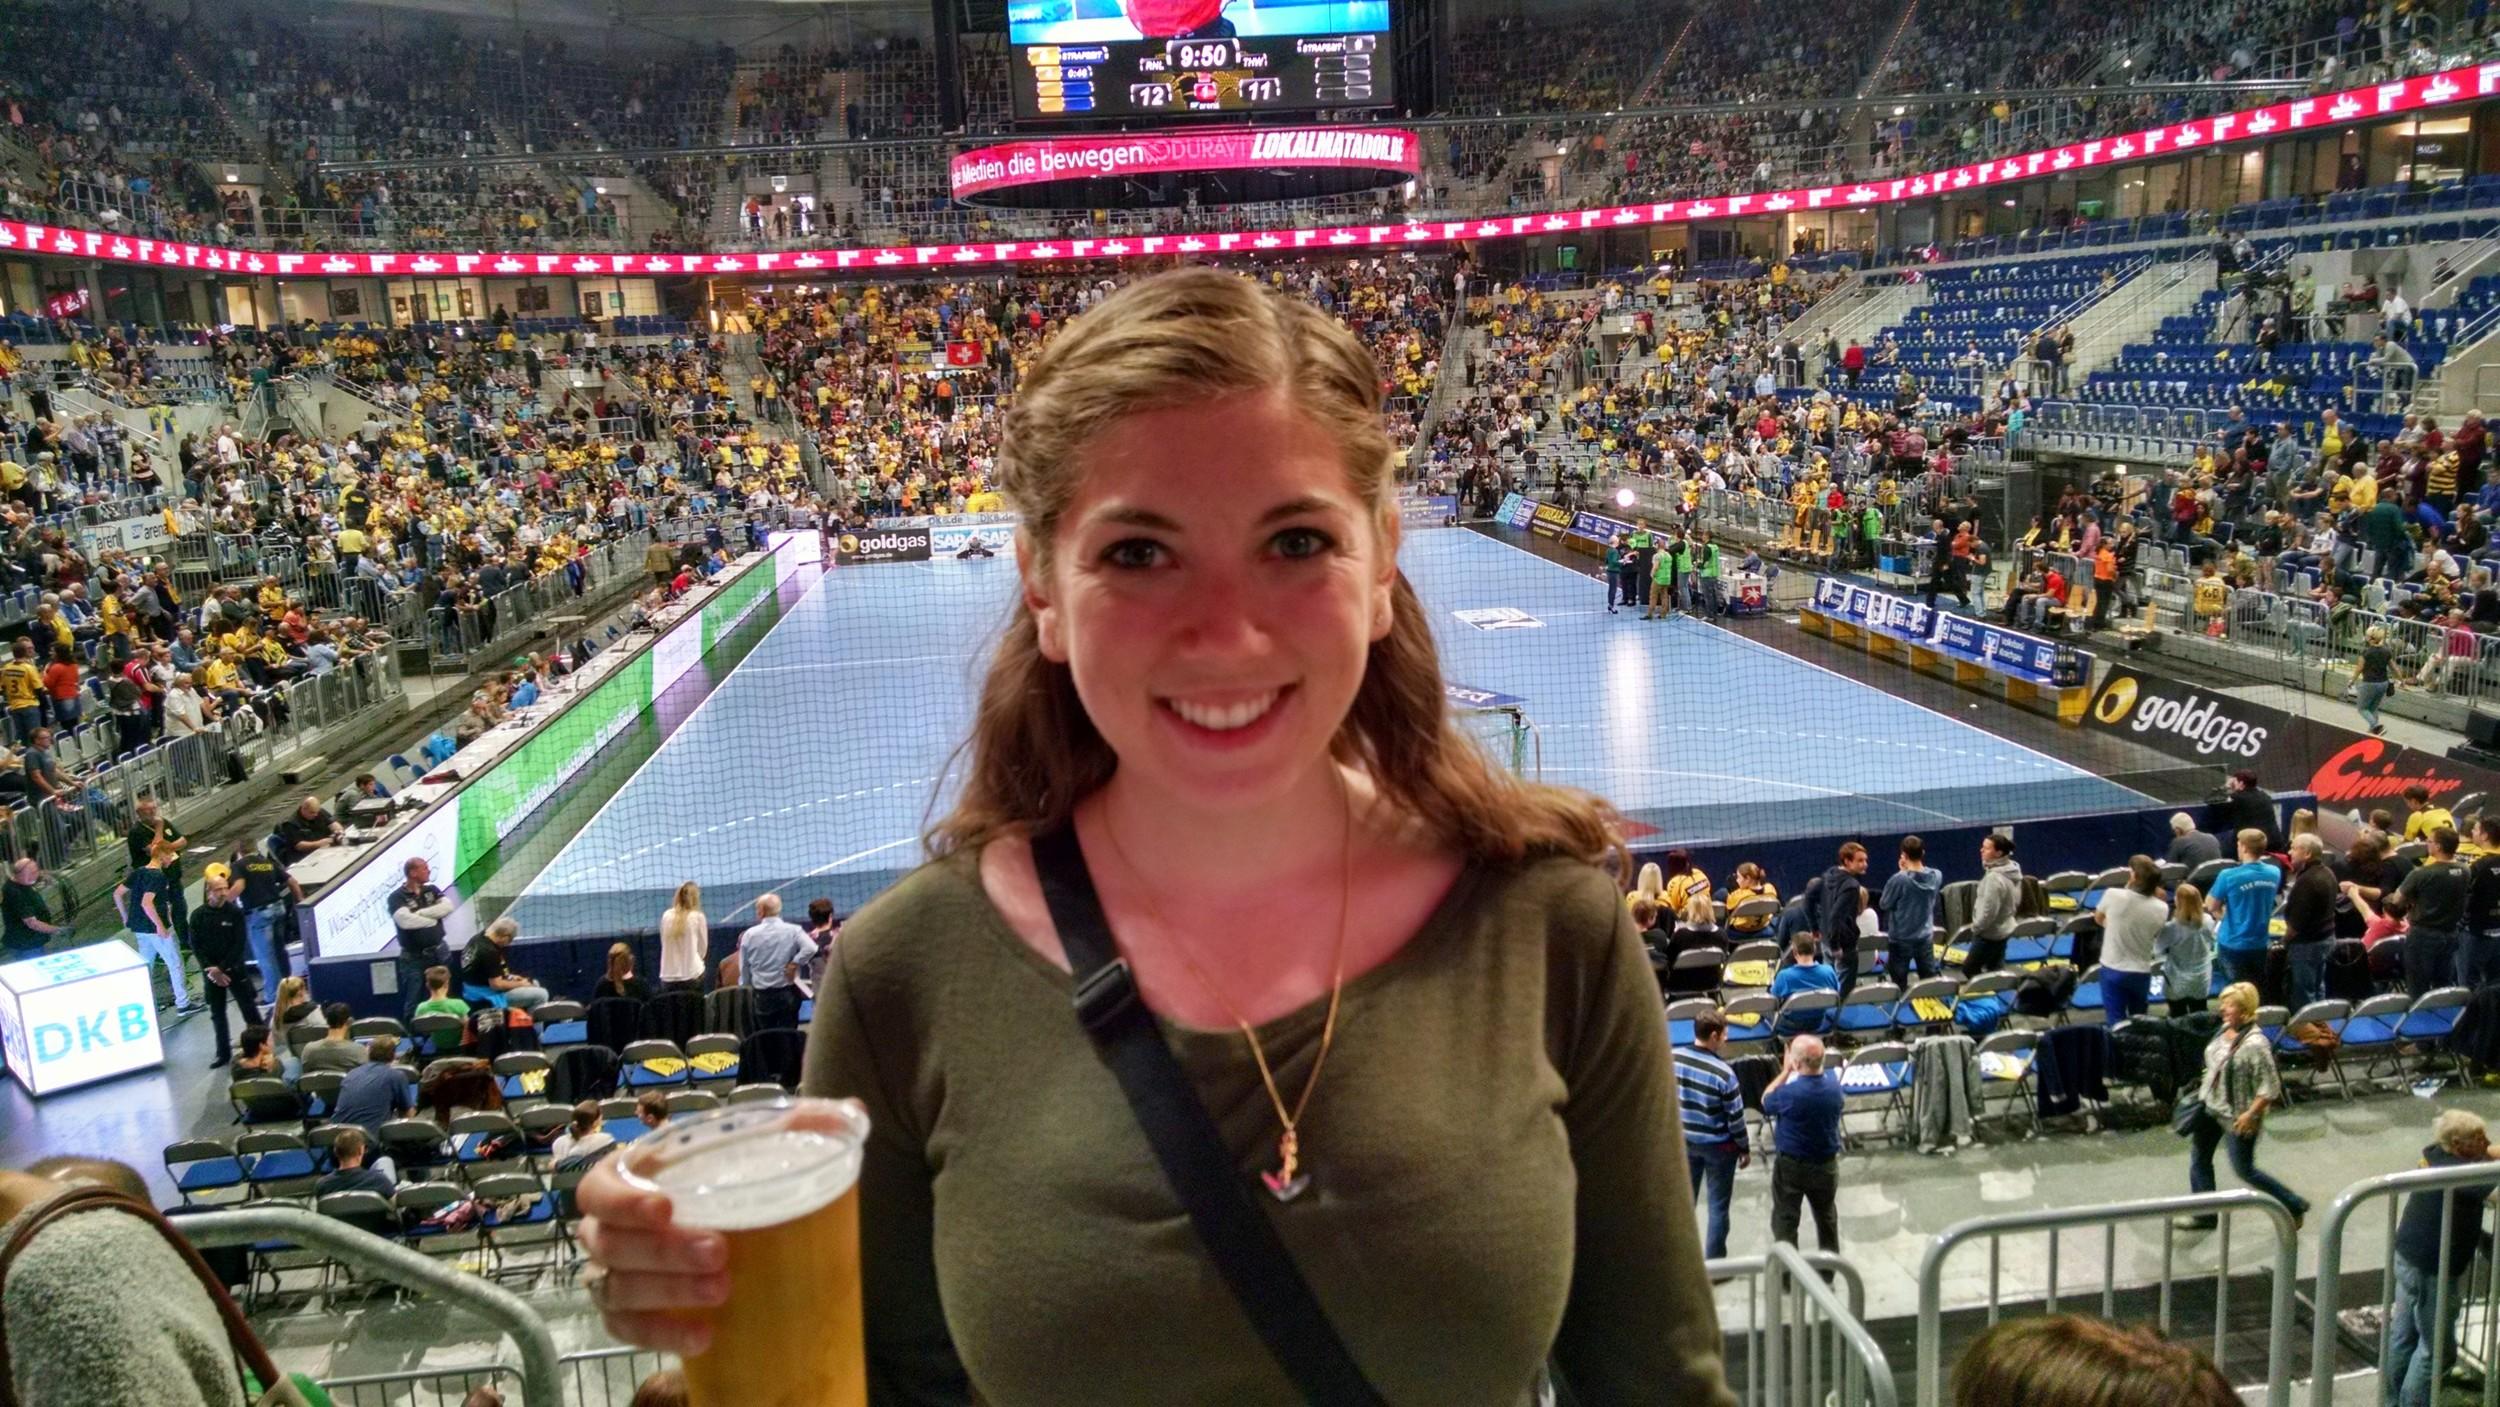 Meghan enjoying her intermission beer. As always, the beer was cheaper than water.